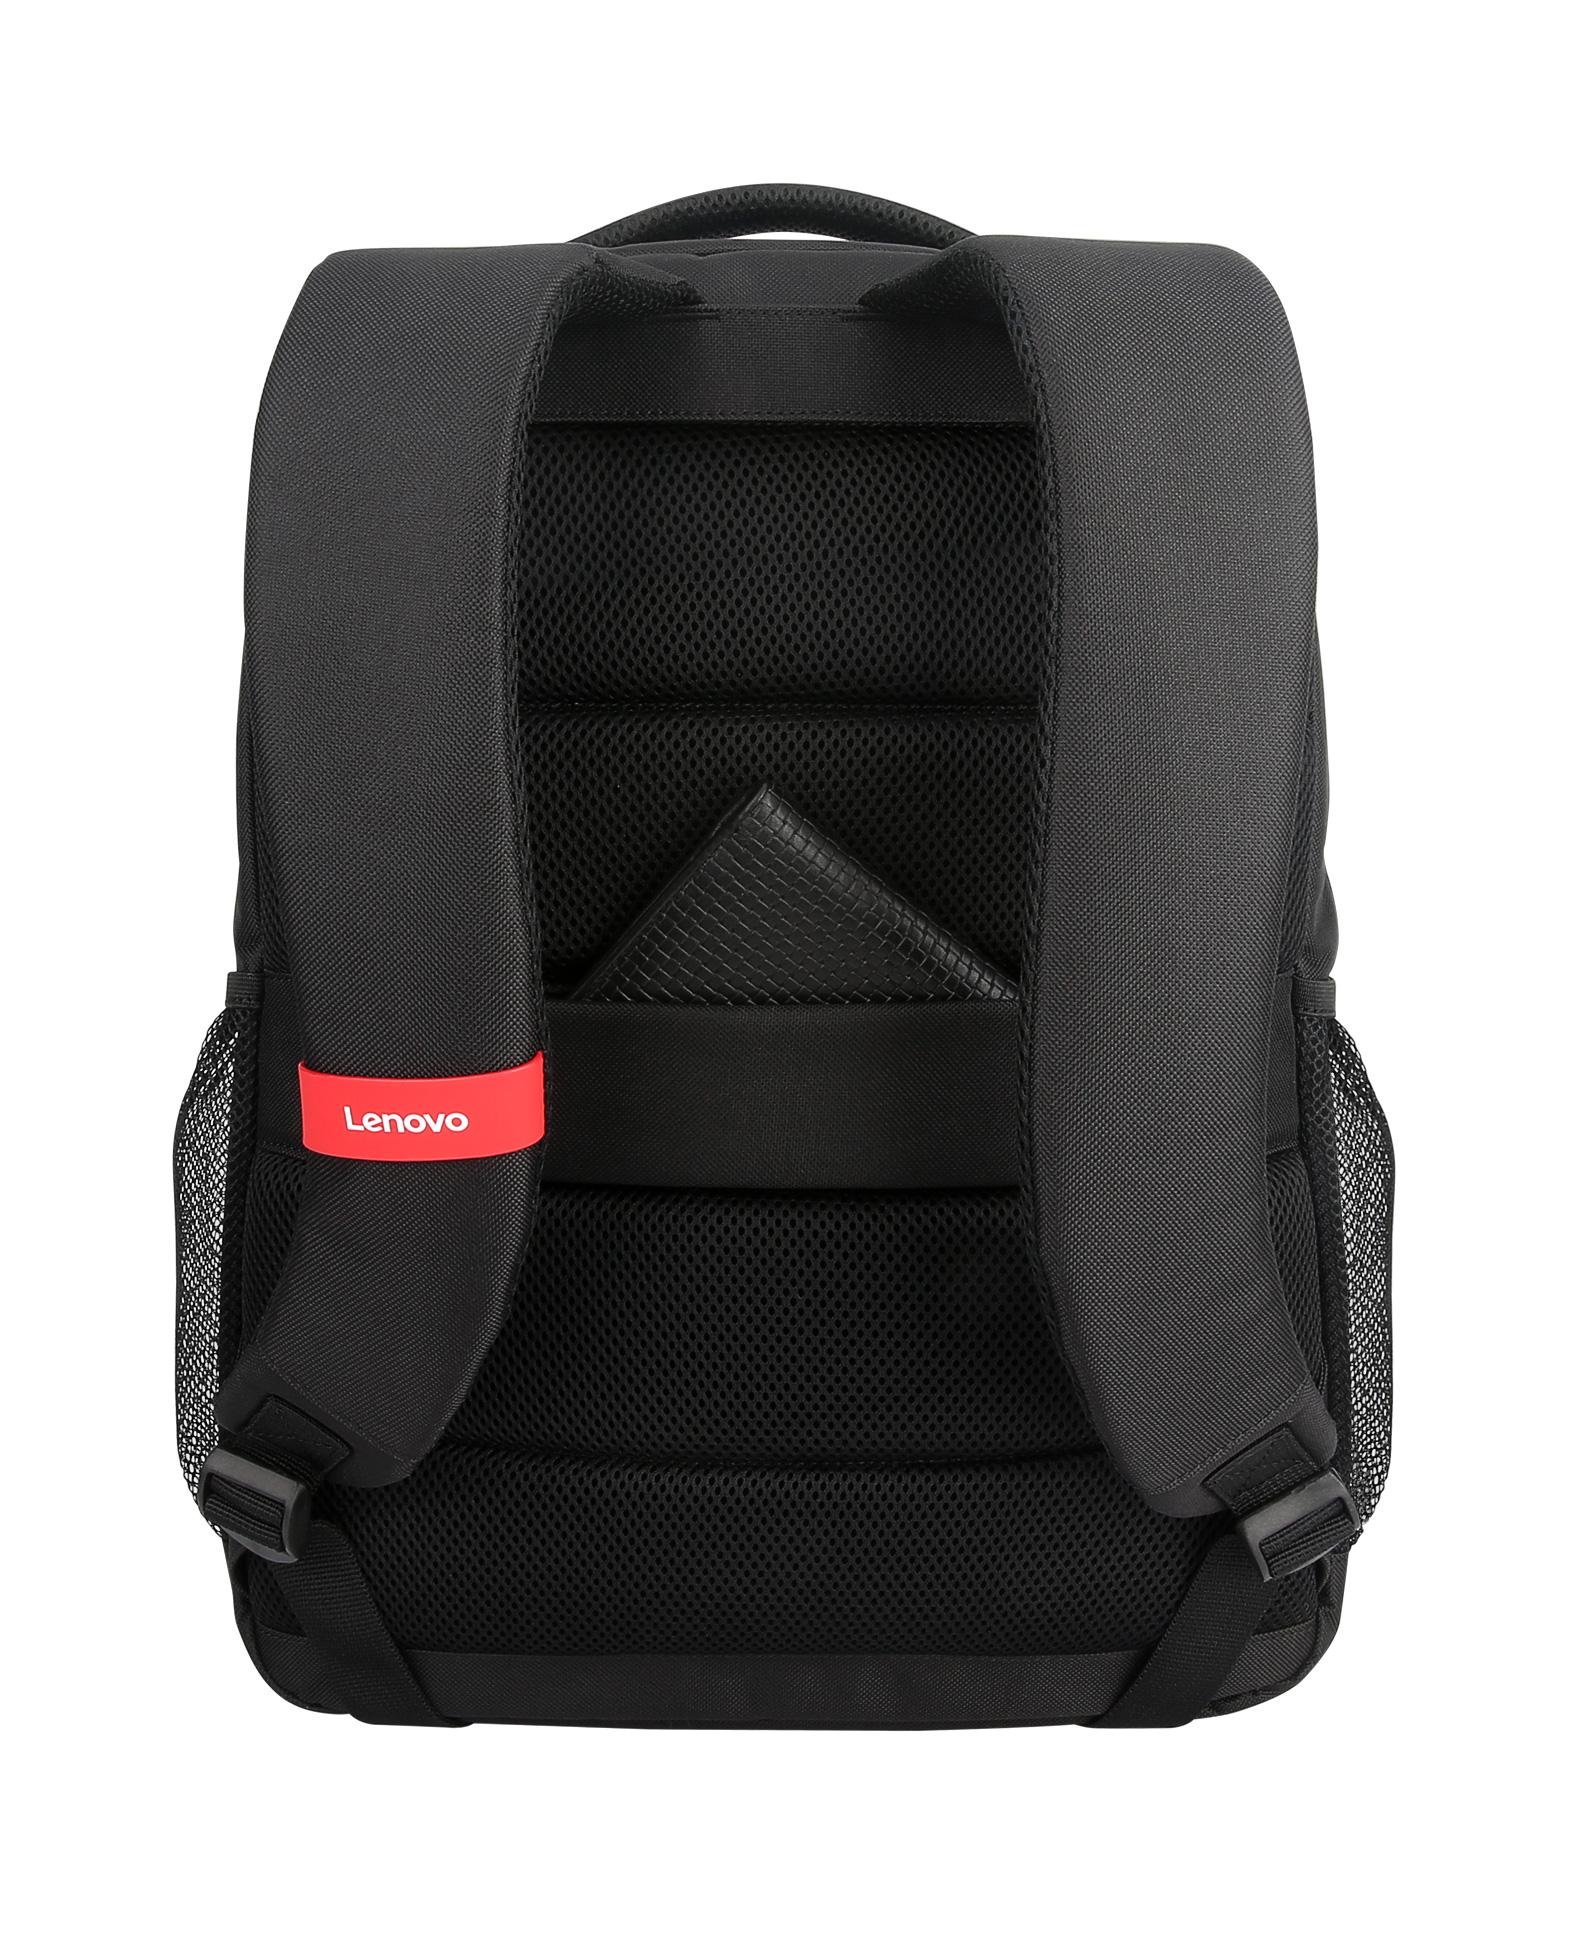 "Фото 3. Рюкзак Lenovo 15.6"" Laptop Everyday Backpack B515 Black (GX40Q75215)"